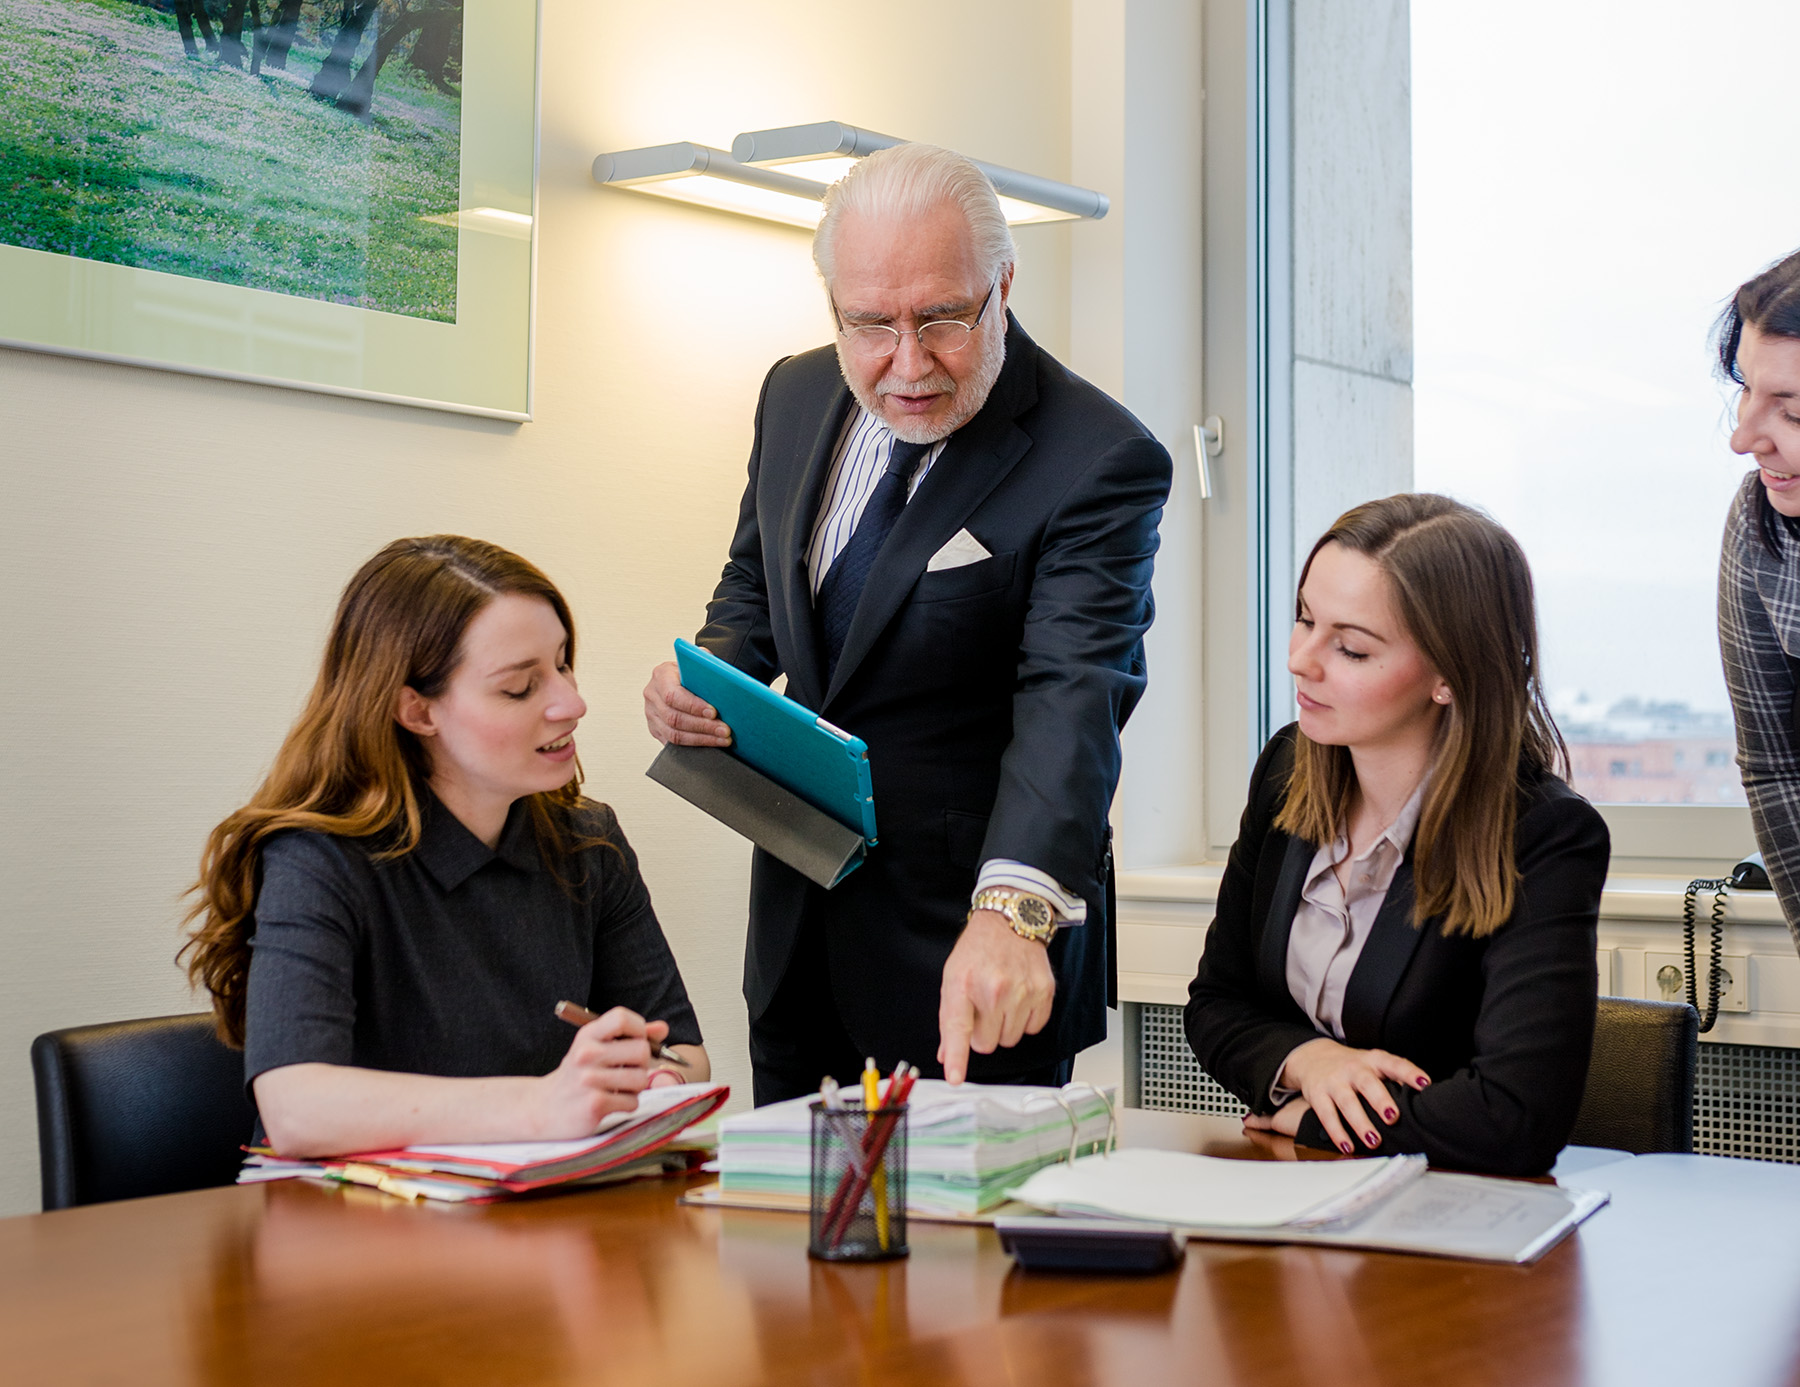 Business; Kanzlei; Imageshooting; Portrait; Anwalt; Berlin